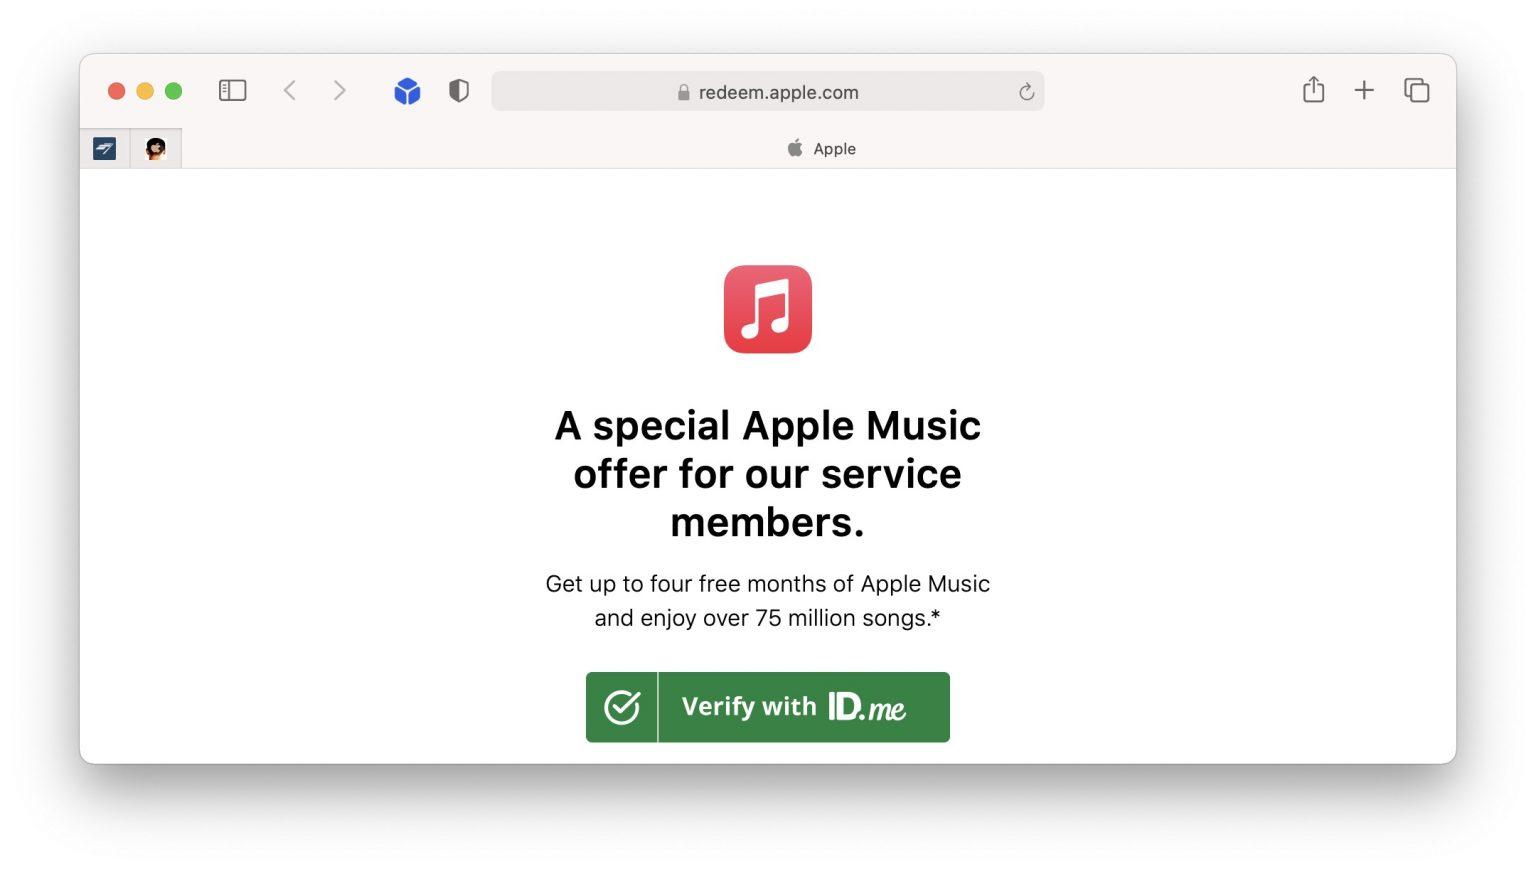 Apple Music military offer